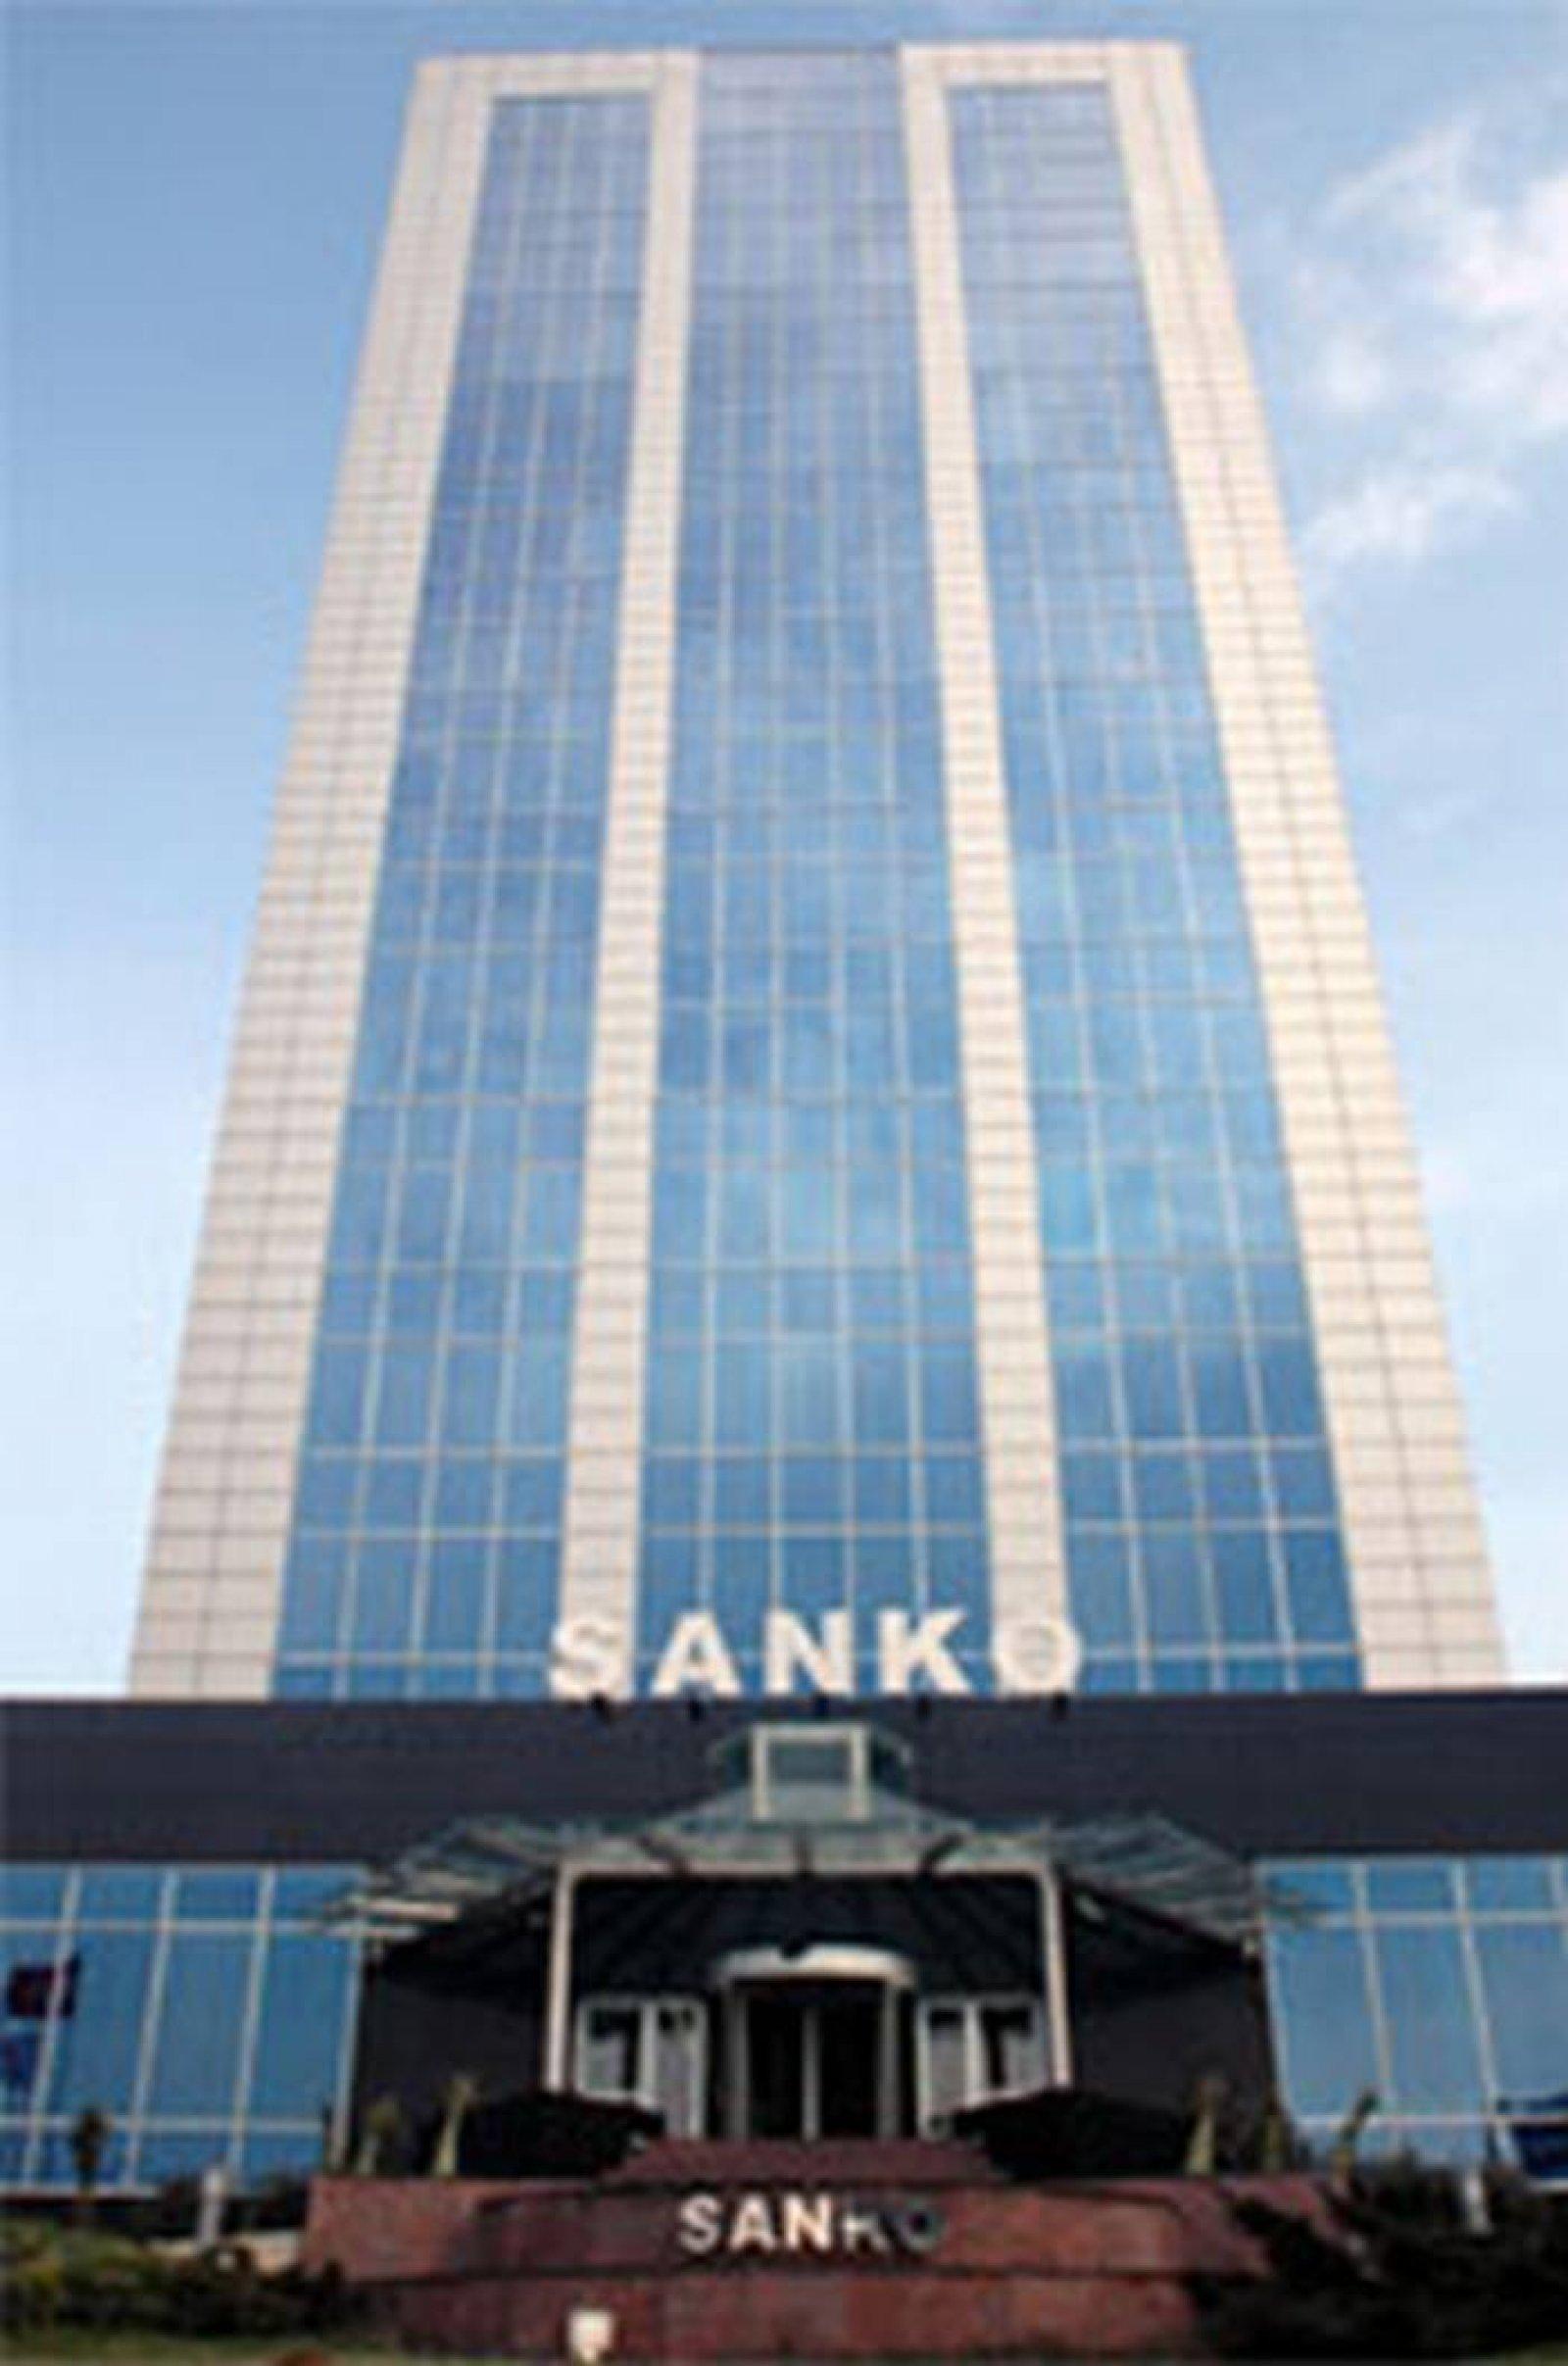 Sanko Holding Genel Merkezi